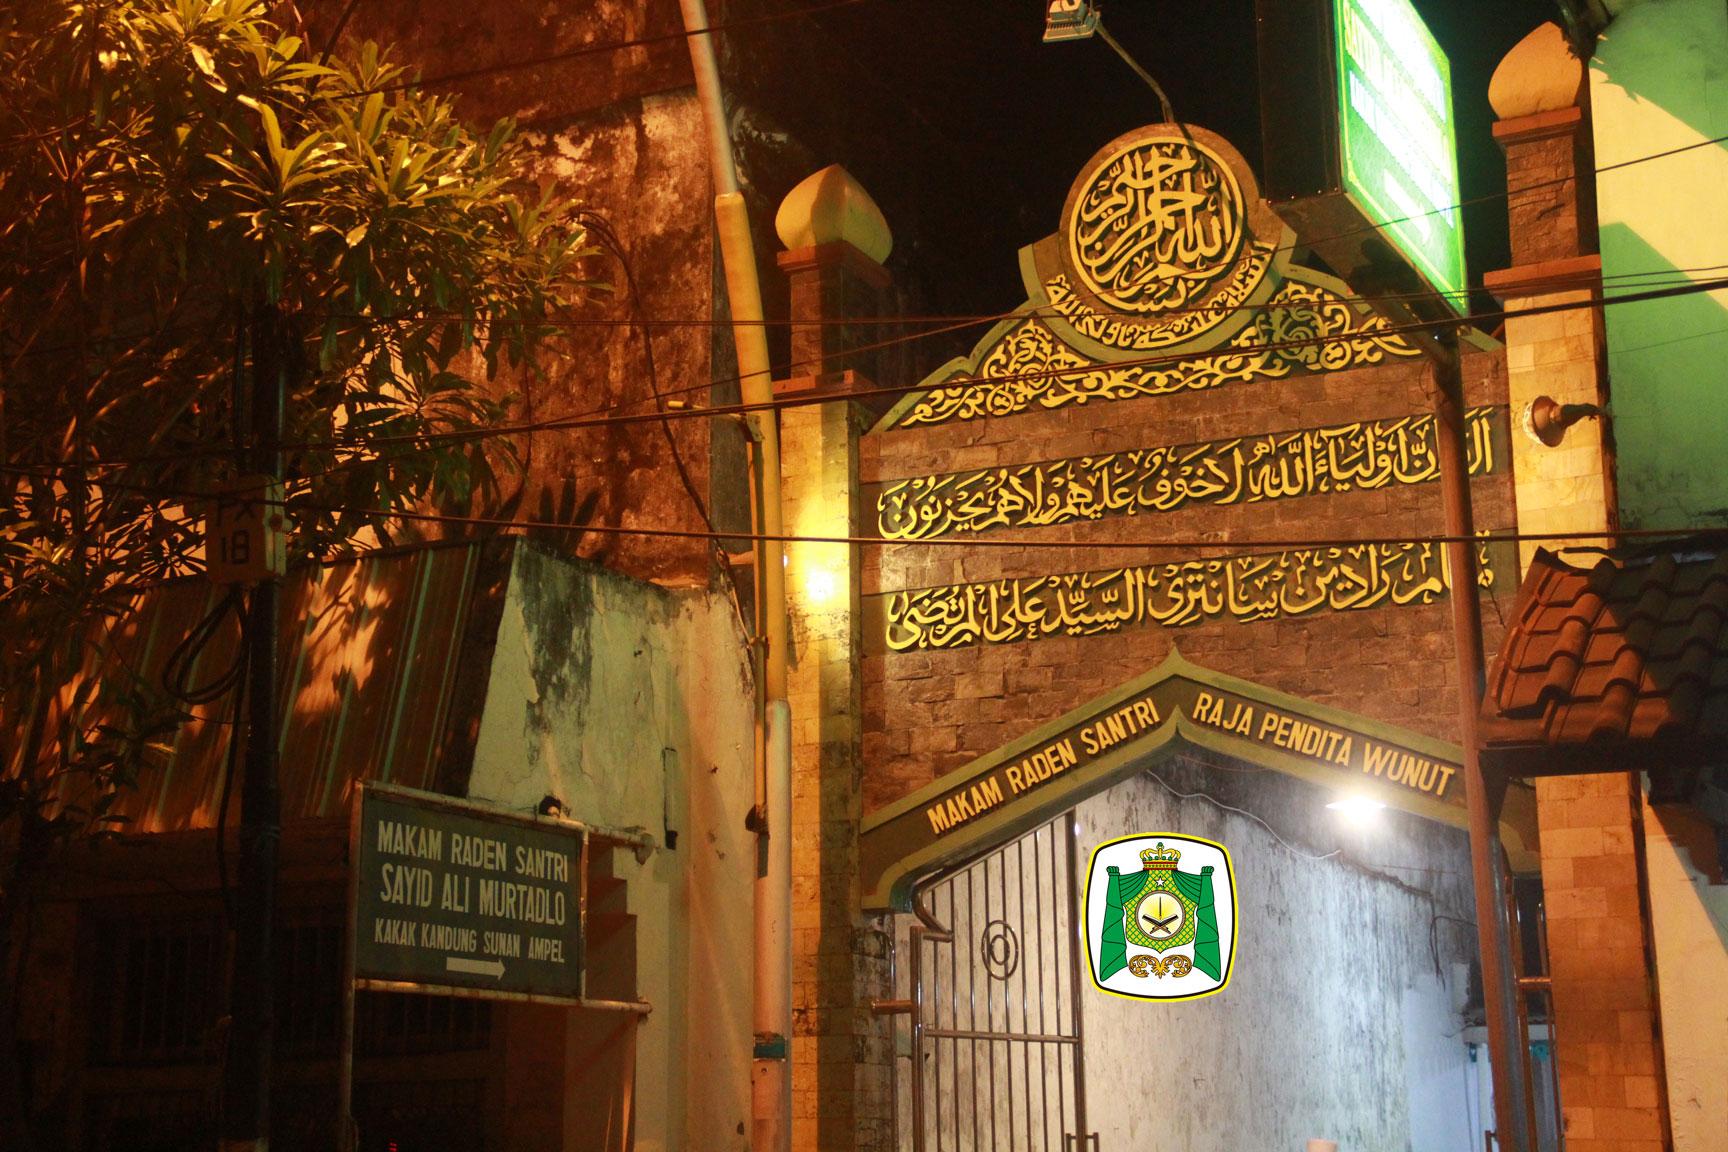 Sayyid Ali Murtadlo Raden Santri Almunawwarah Trans Nasab Beliau Putra